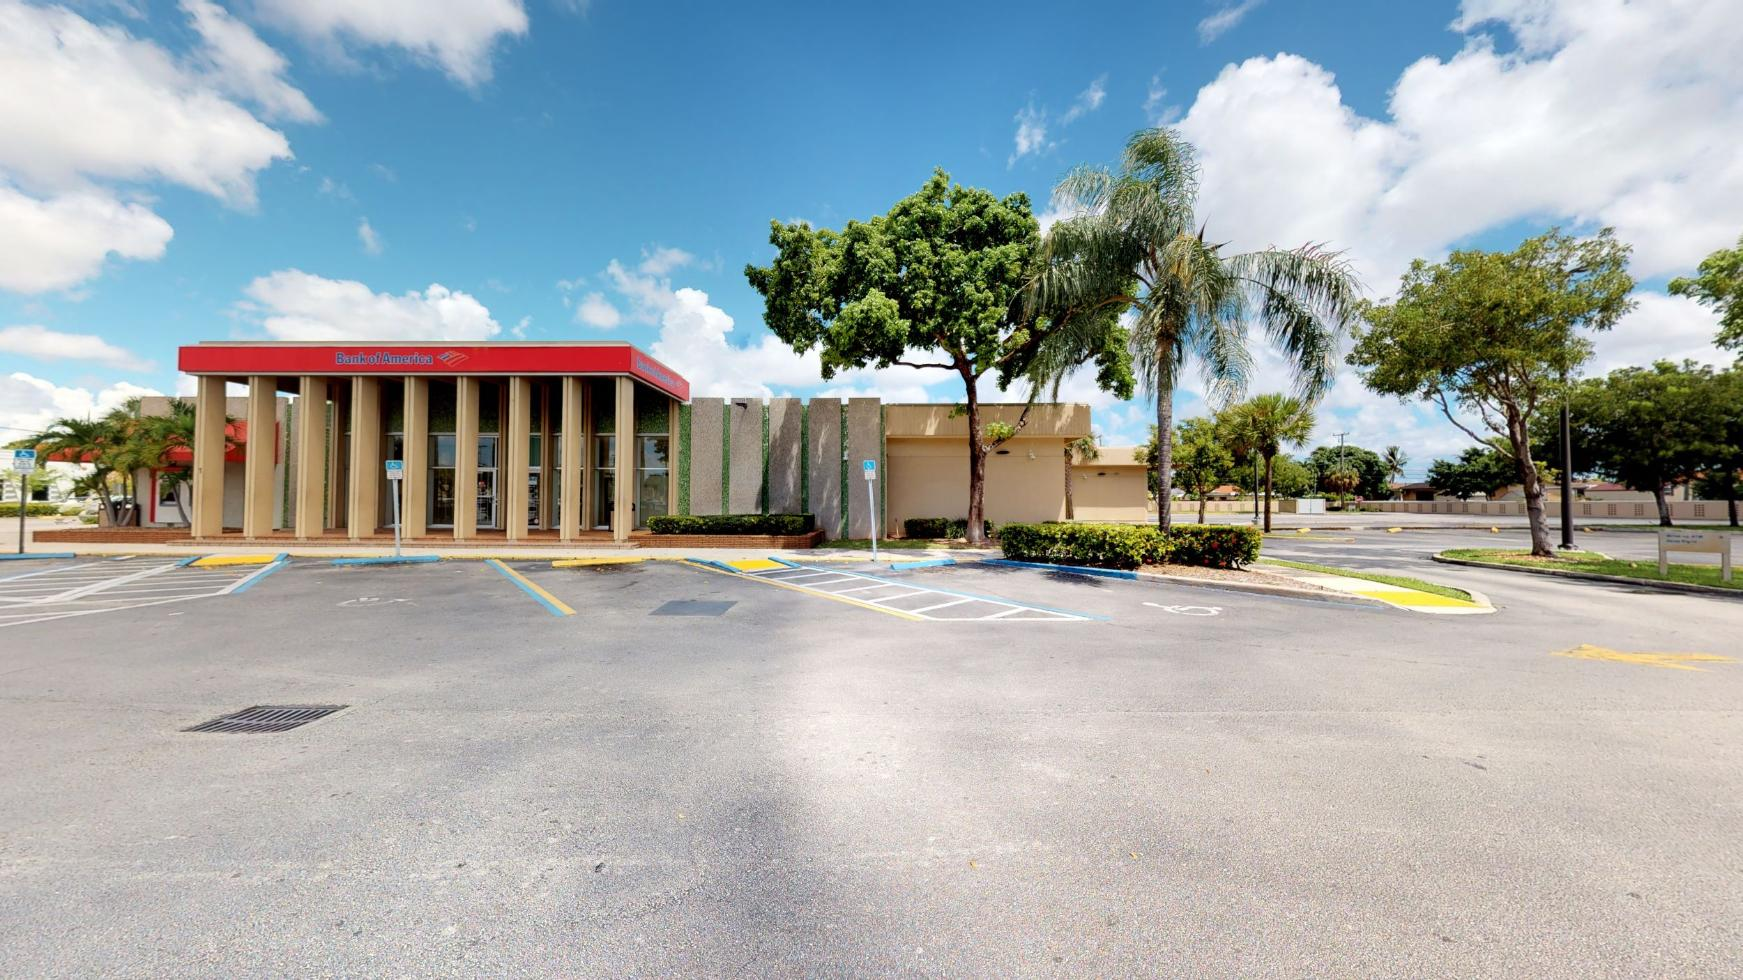 Bank of America financial center with drive-thru ATM | 1 E 49th St, Hialeah, FL 33013